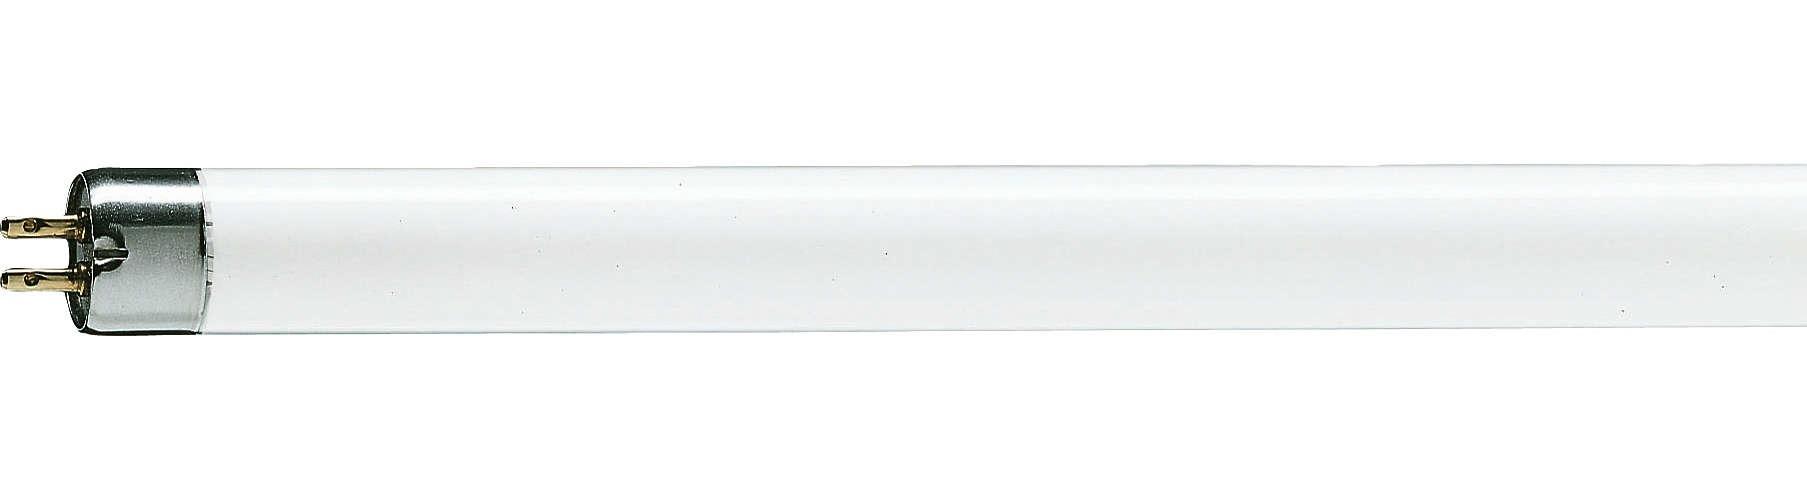 Korting Philips TL mini buis 8W 16mm 30cm kleur 827